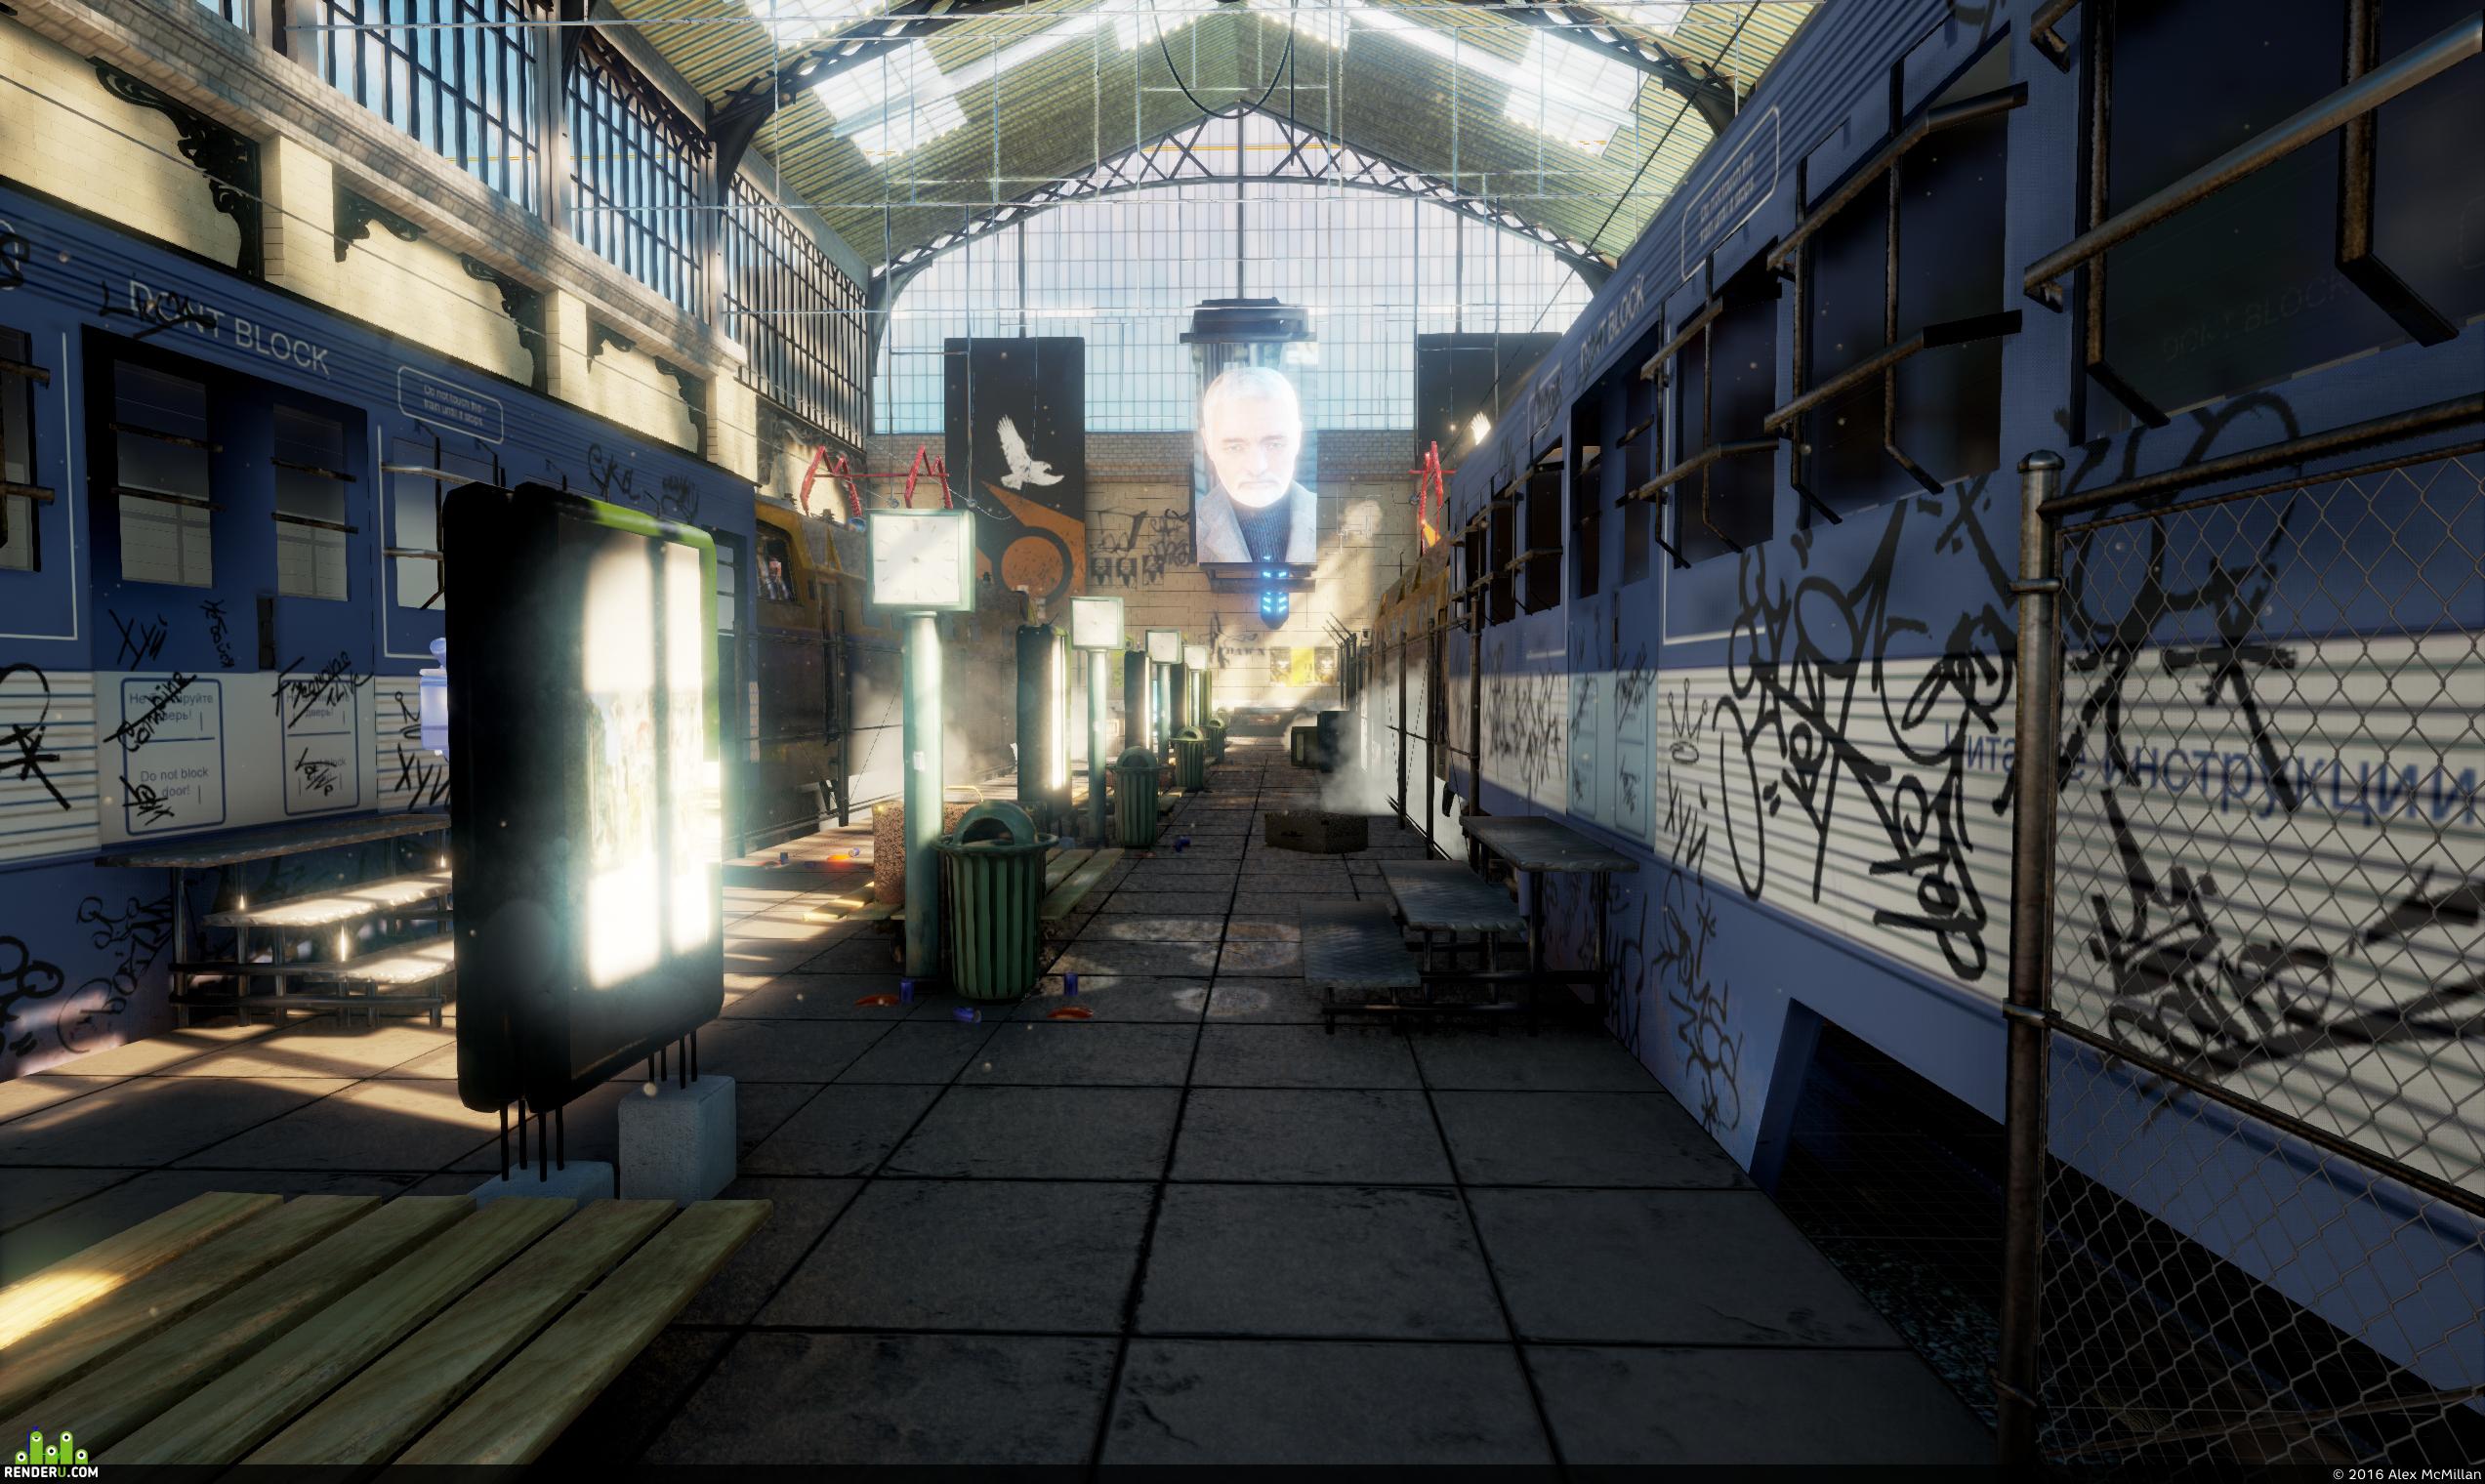 Half-Life 2 Railway Station [Unreal Engine 4]